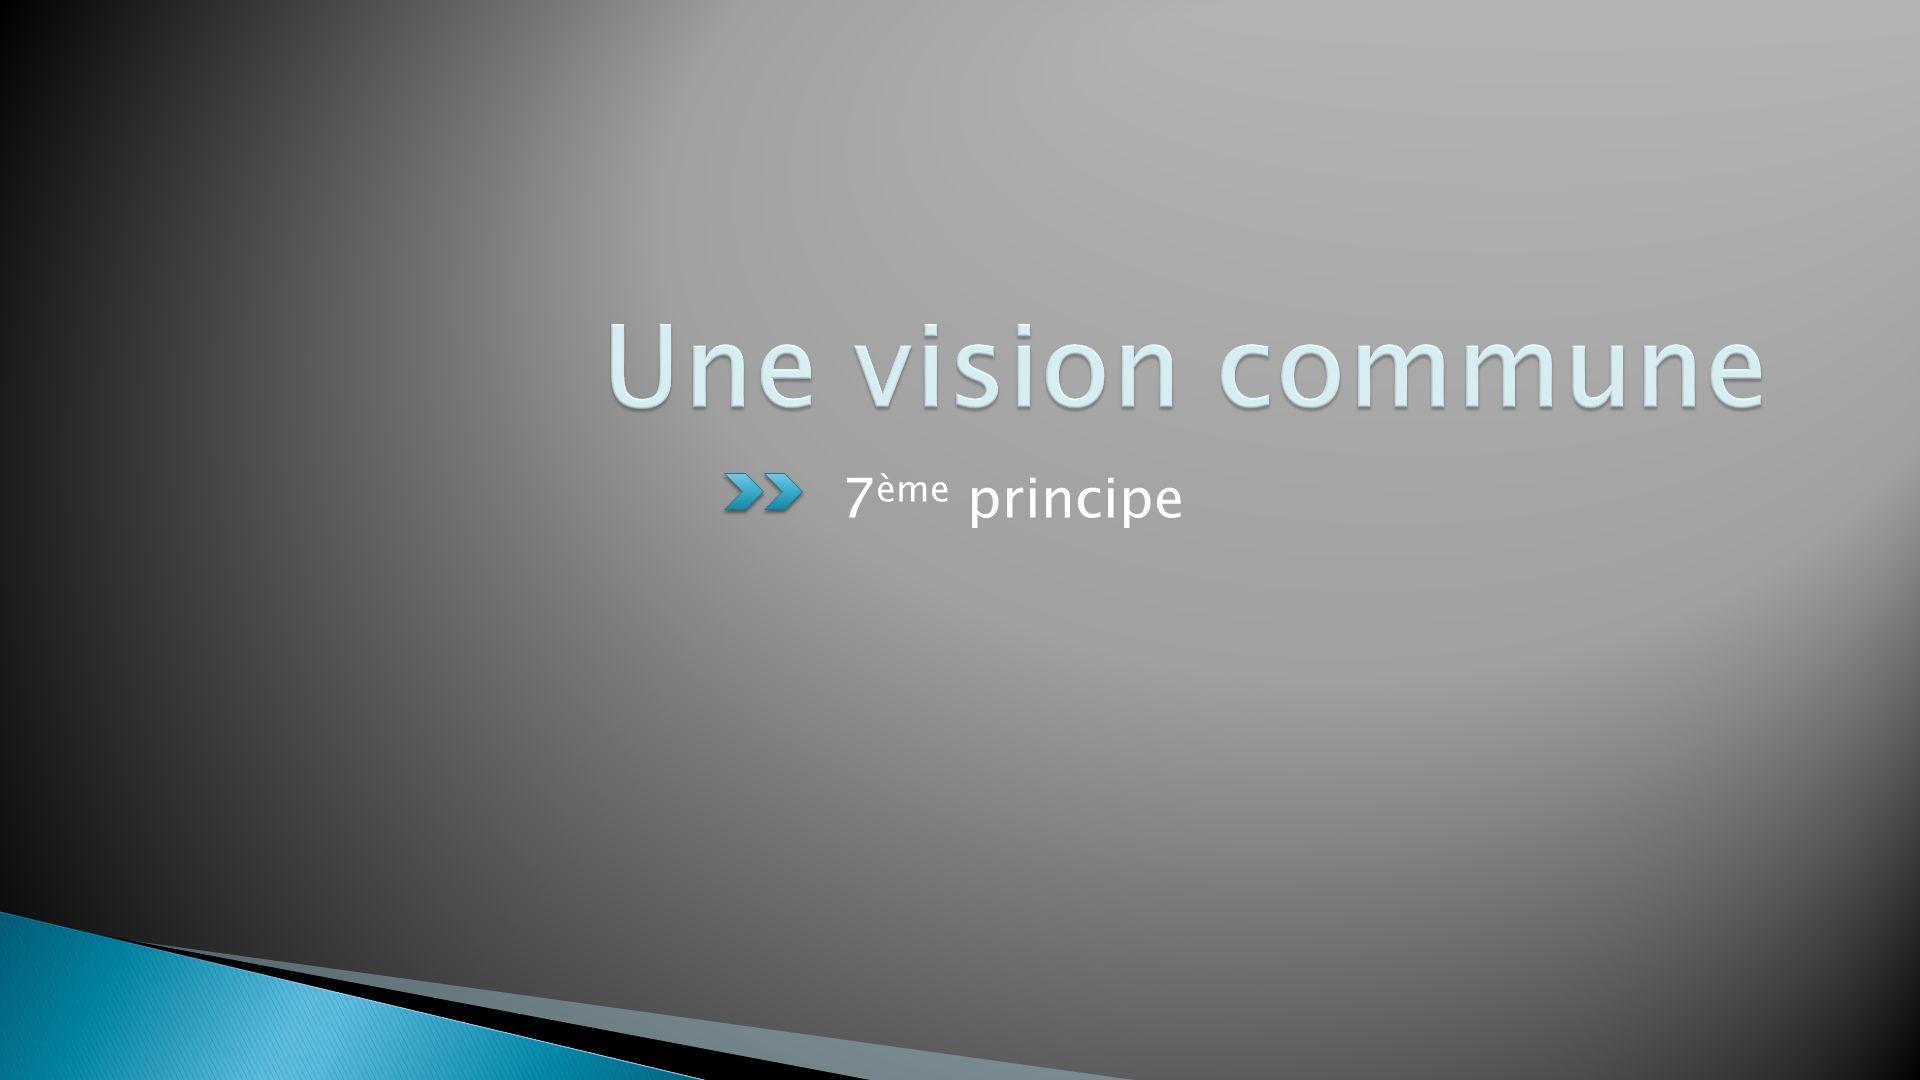 Une vision commune 7ème principe